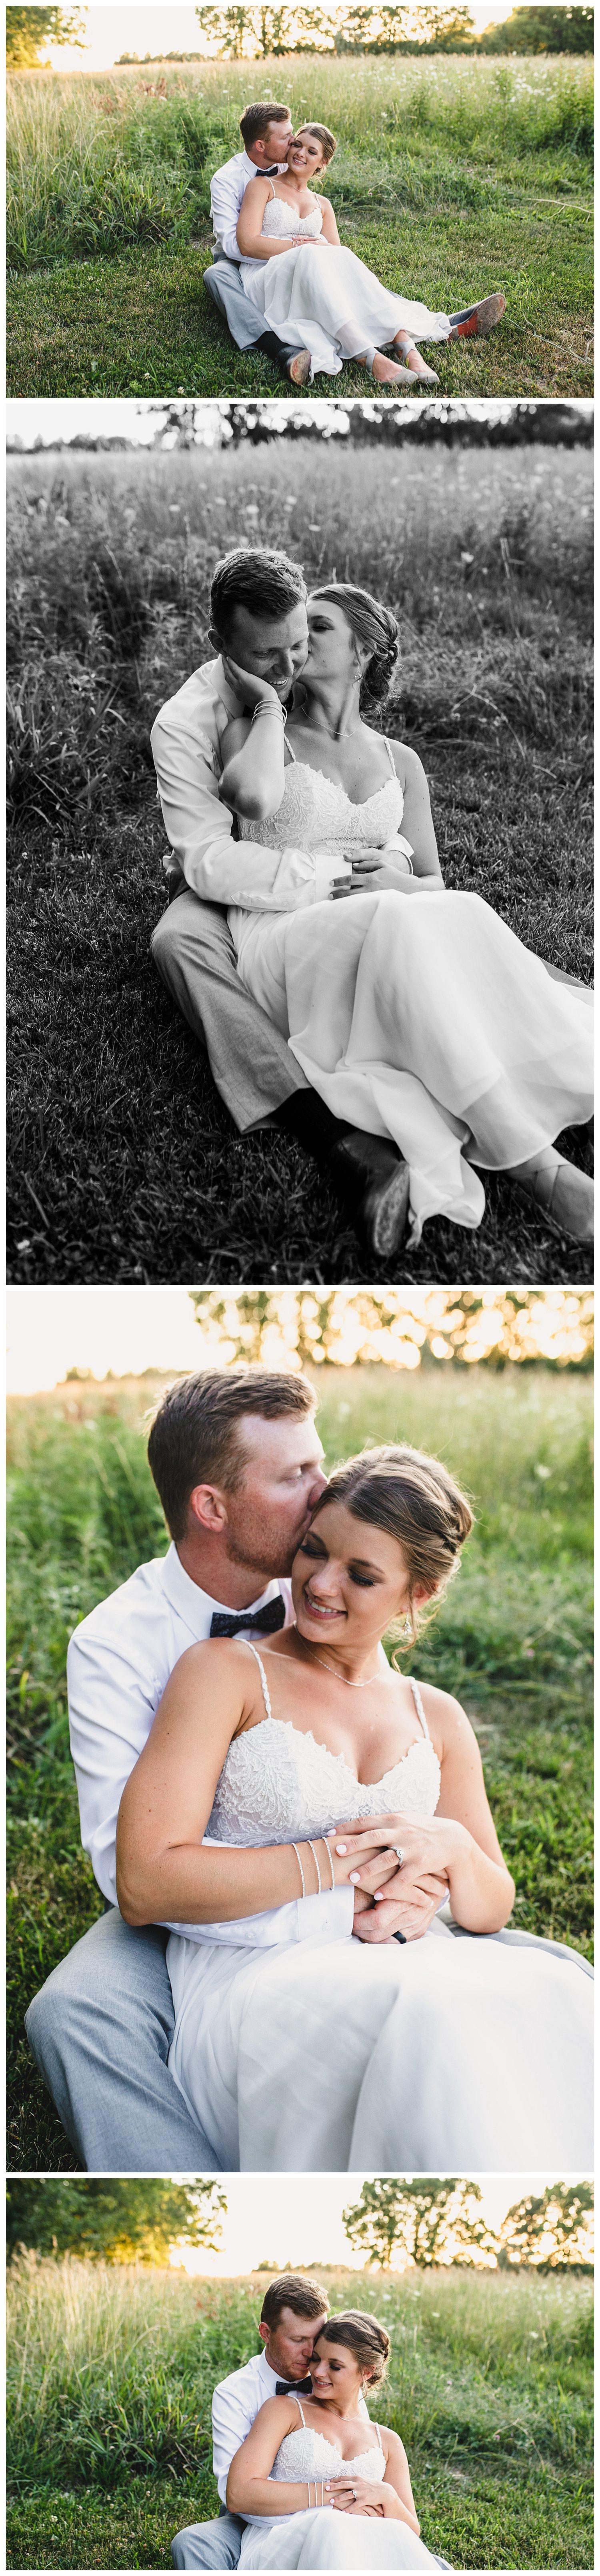 Kelsey_Diane_Photography_Kansas_City_Engagement_Wedding_Photographer_Midwest_Traveling_Missouri_Lee_Andrew_Hall_And_Garden_Blue_Springs_Wedding_Clayton_Kimberly_Summer_Wedding_0852.jpg